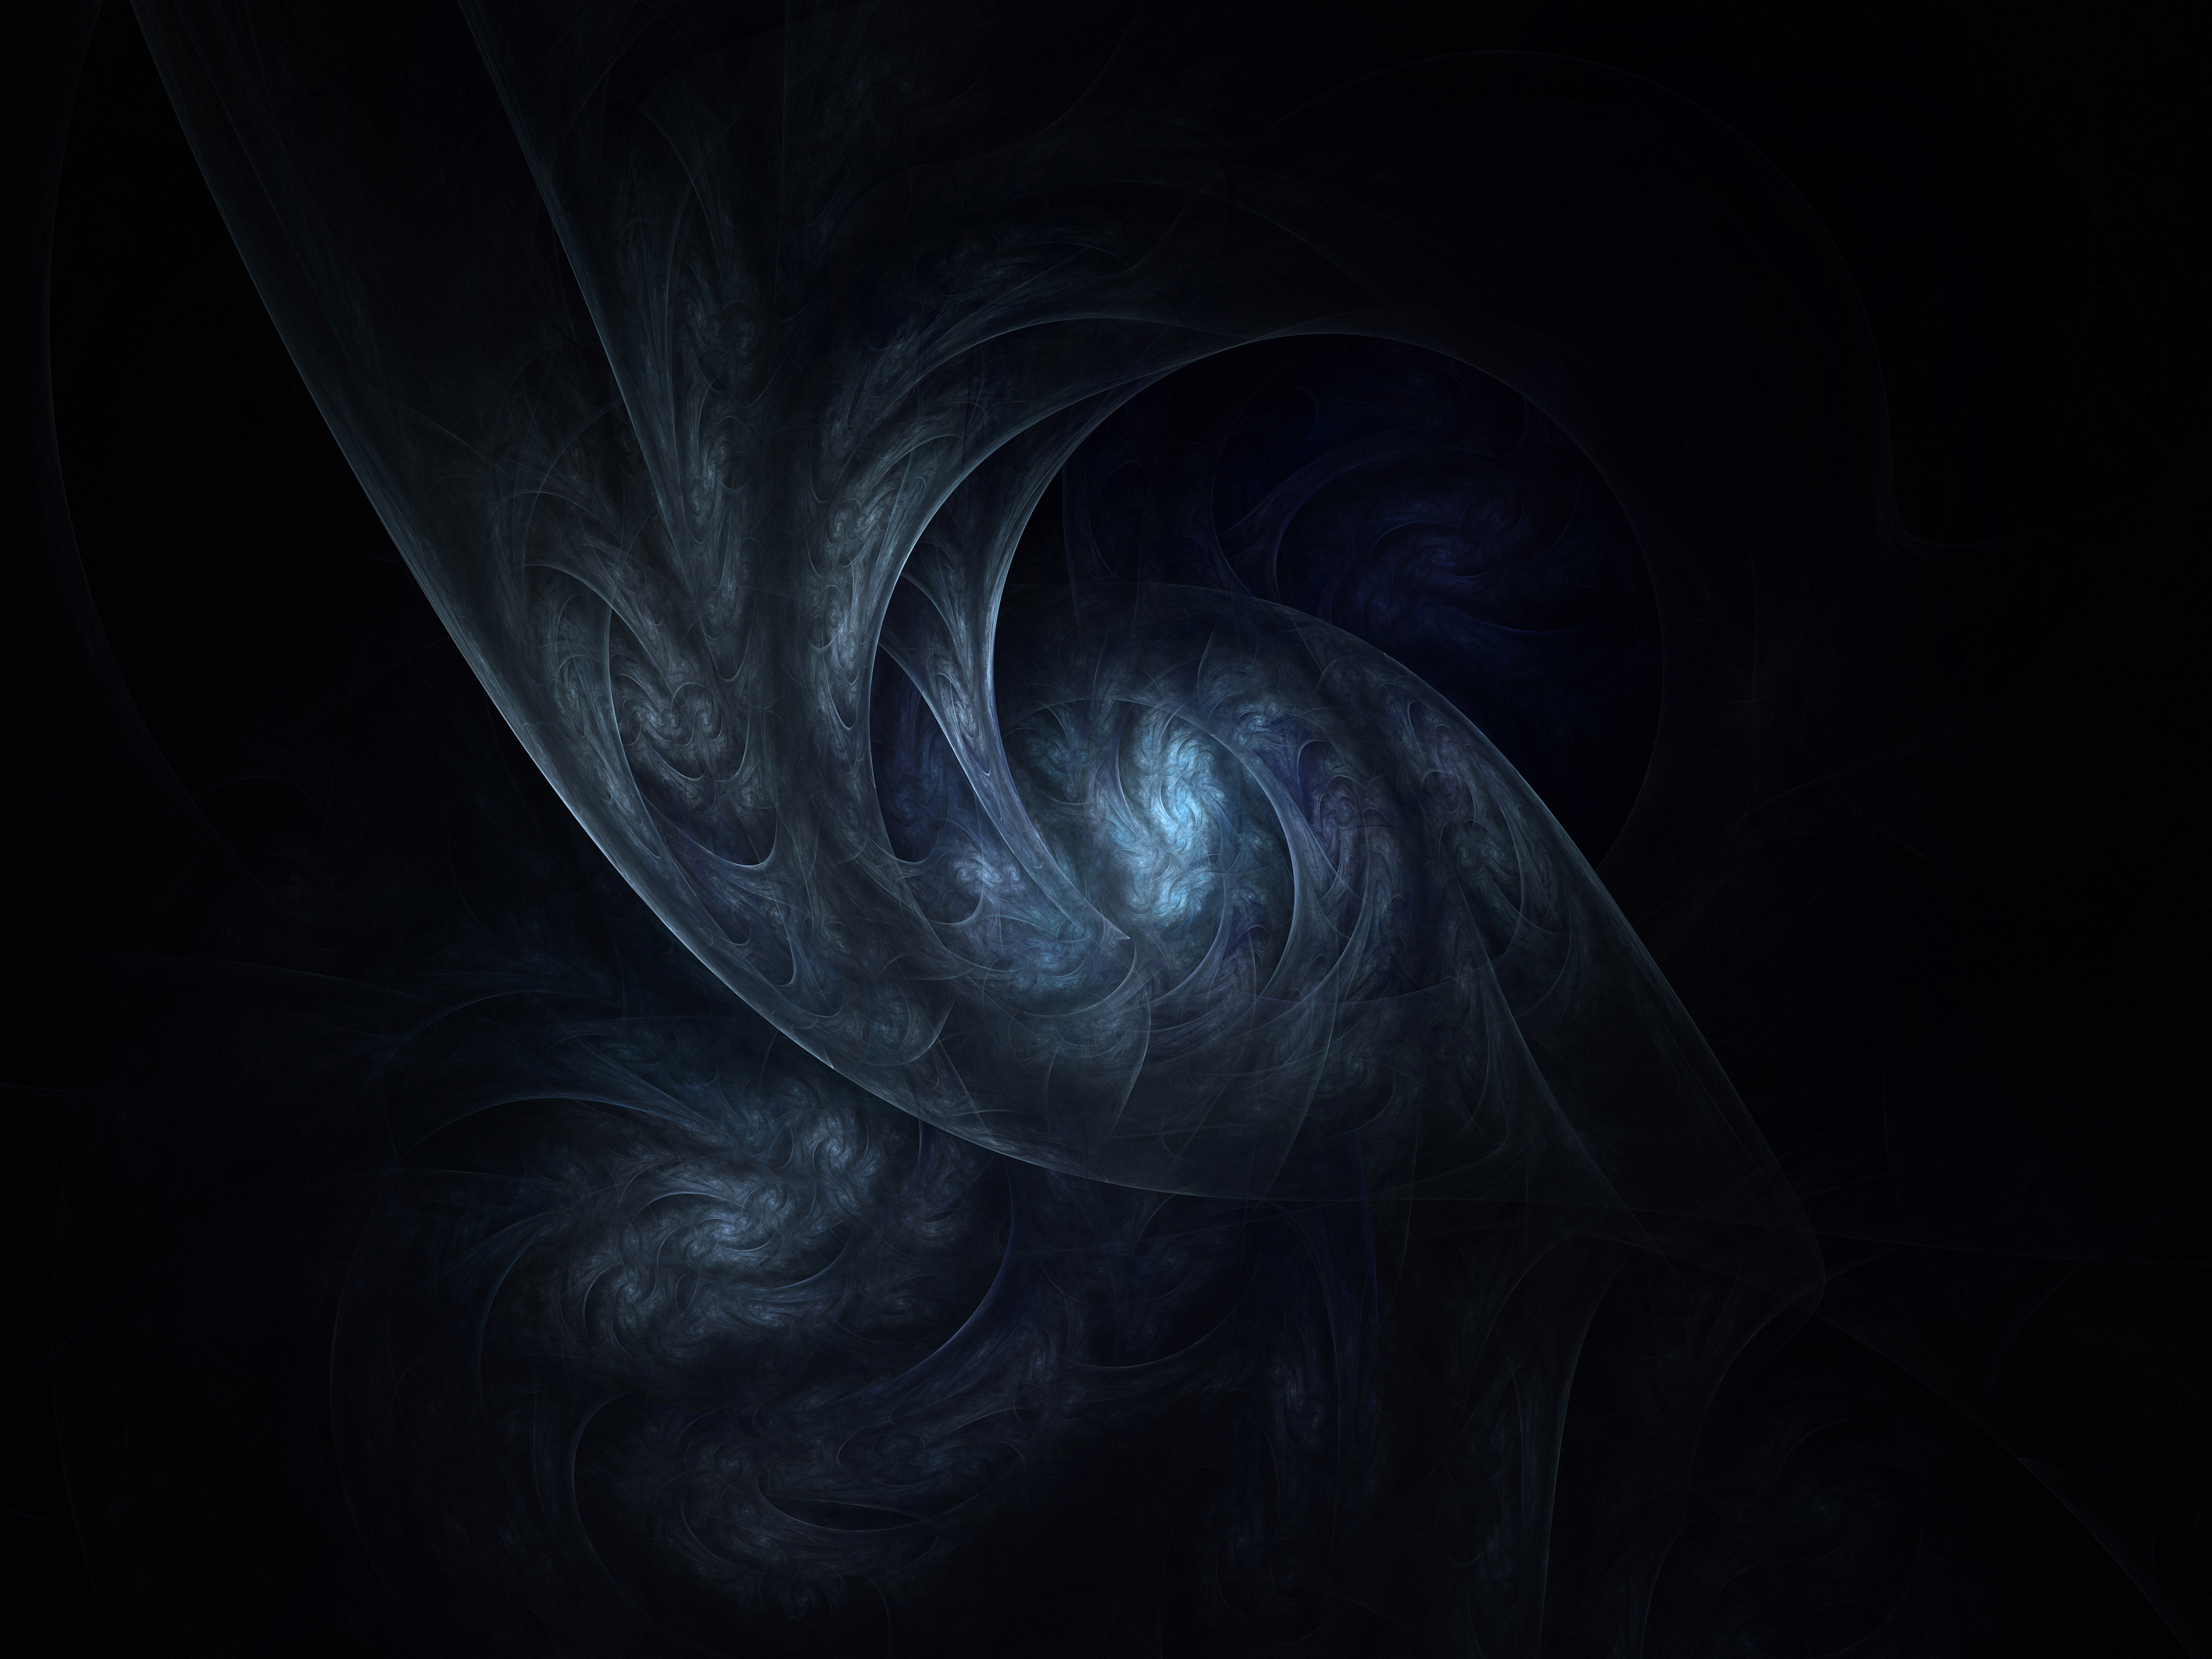 texture dark web abstract nether world abyss blue grey light wallpaper 4000x3000